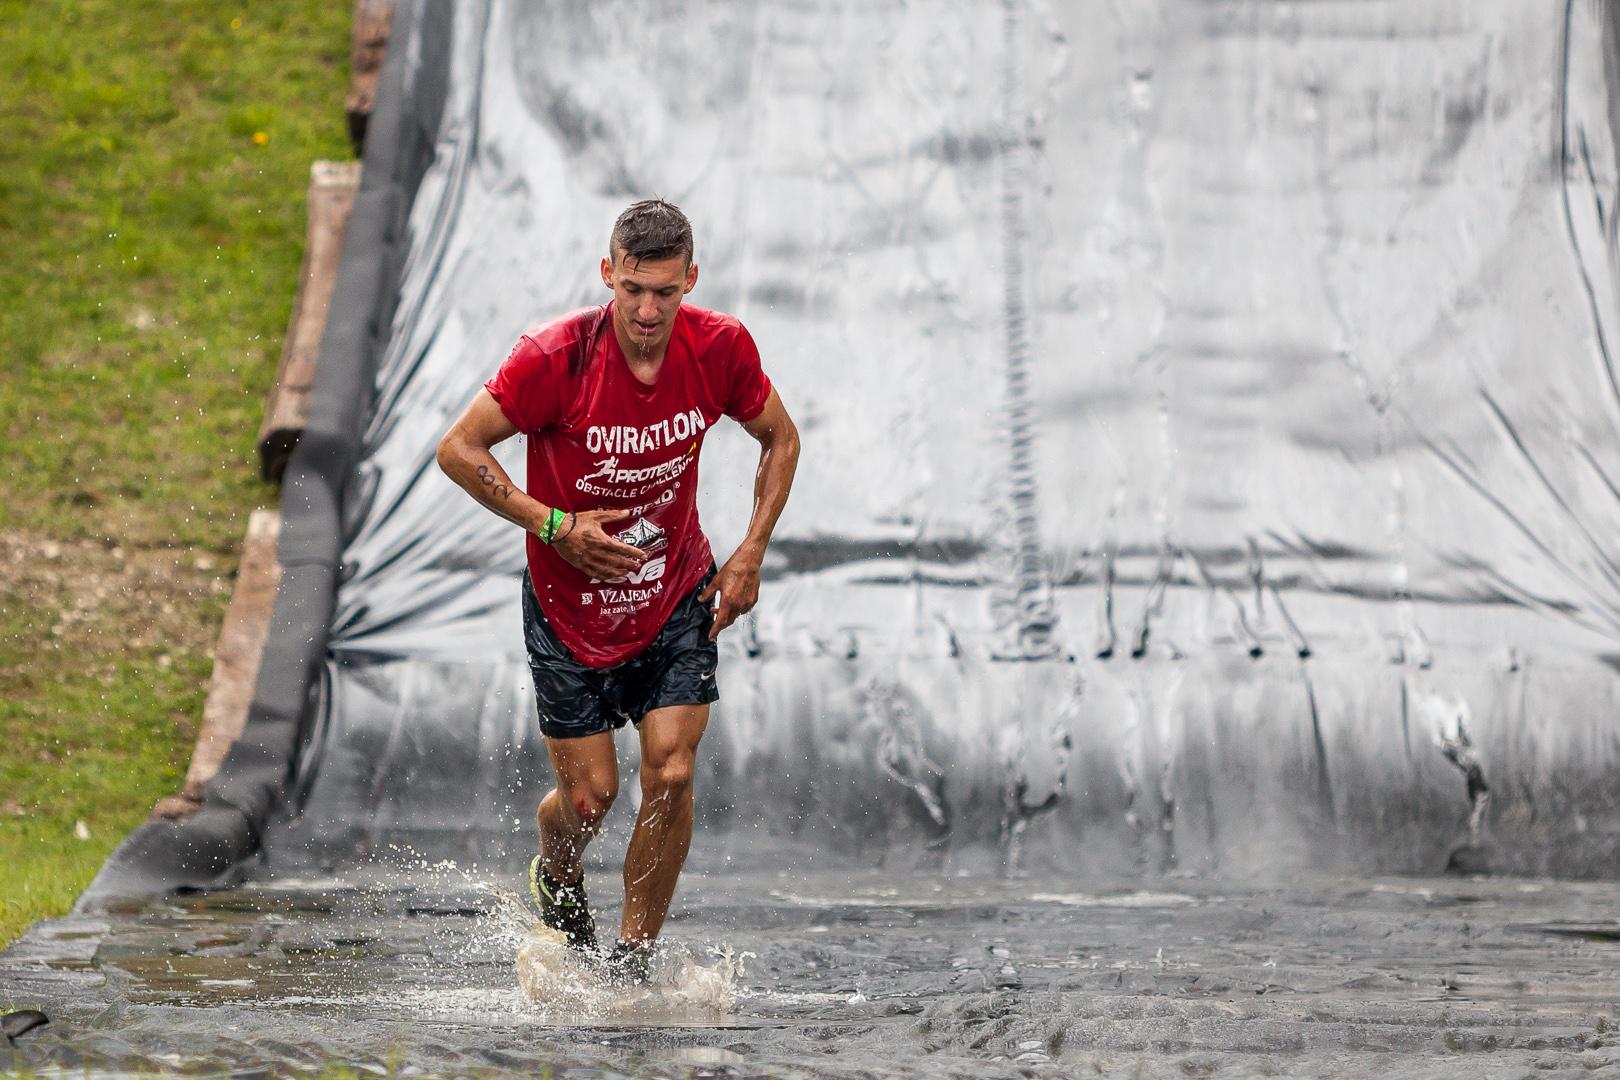 Oviratlon Obstacle Challenge